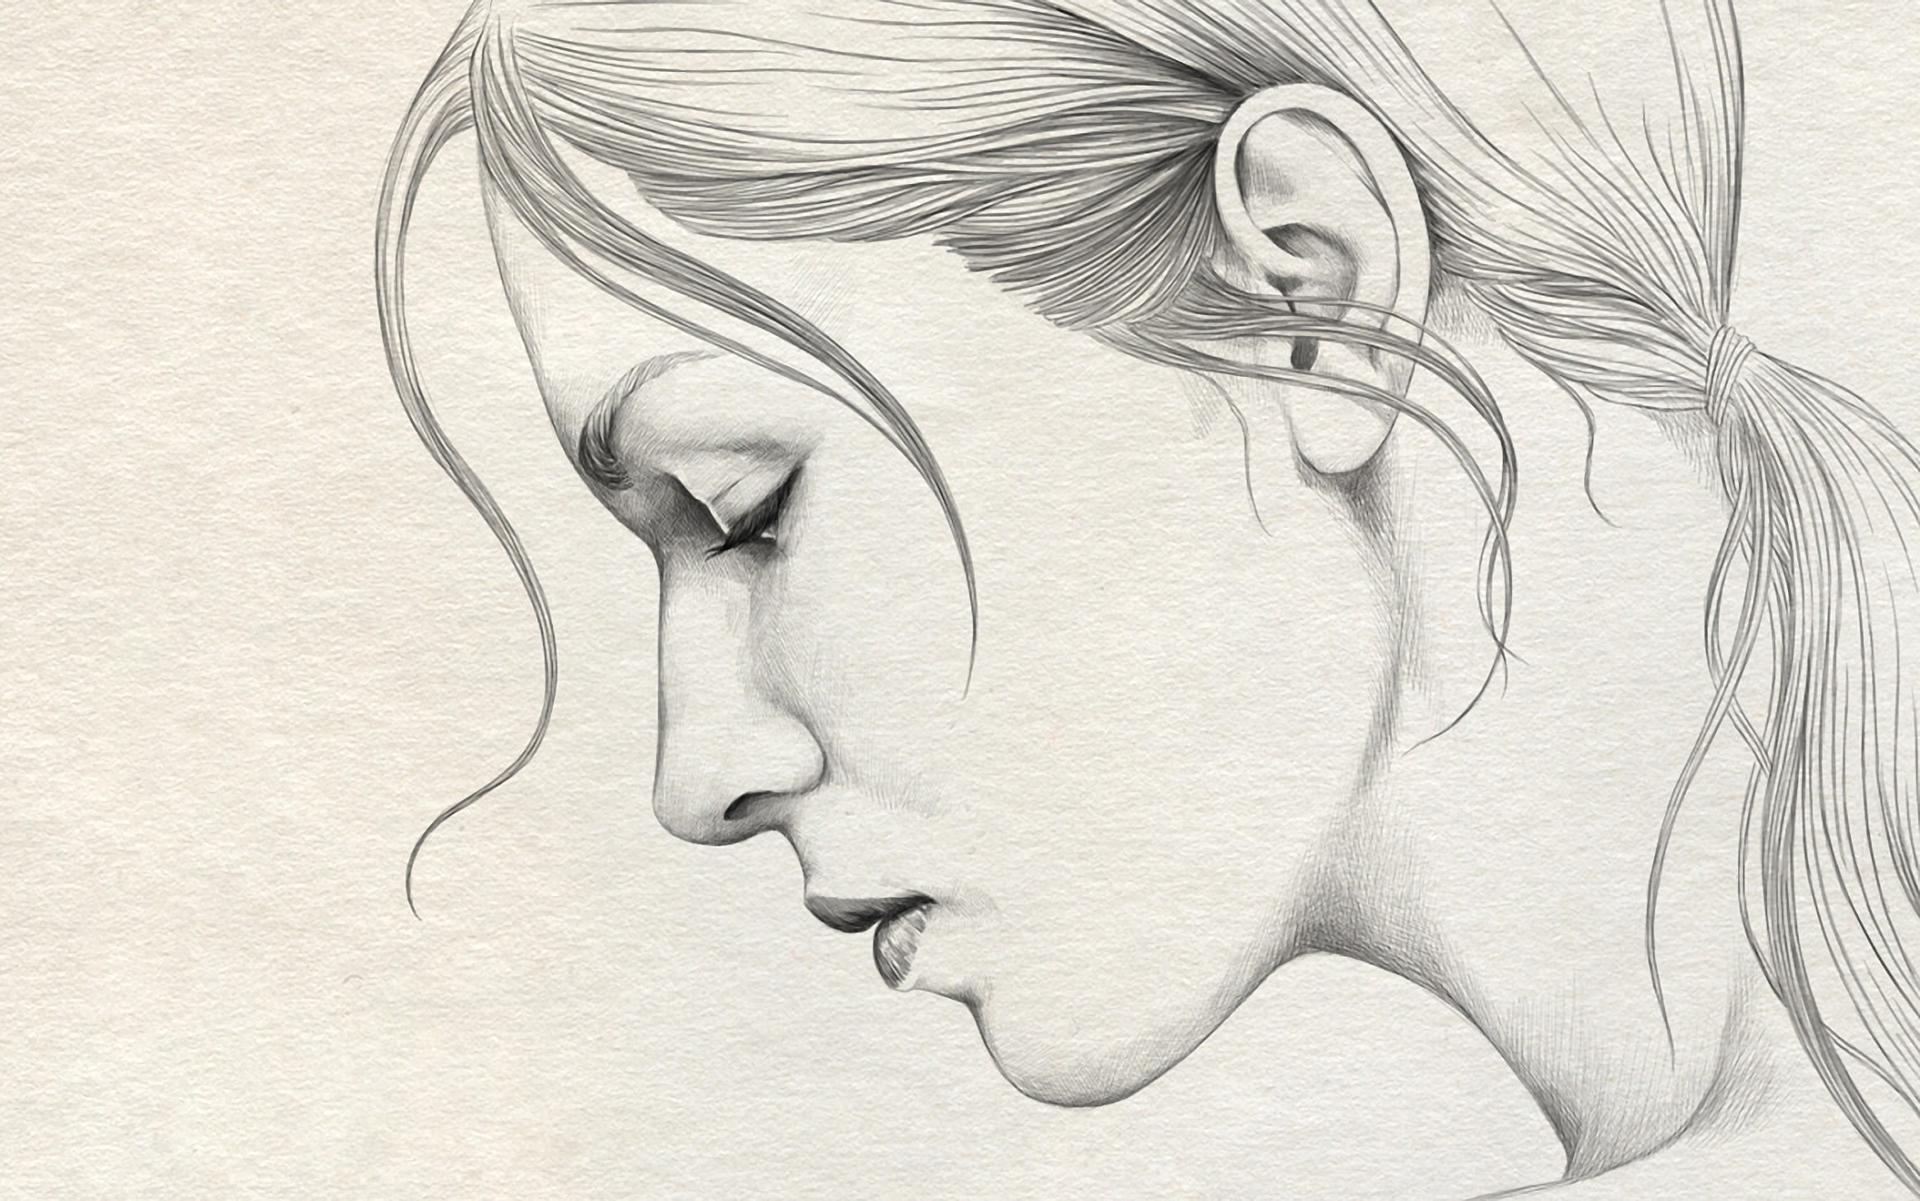 1920x1201 Sketches Of Sad Faces Sad Face Pencil Drawings Sketches Of Sad